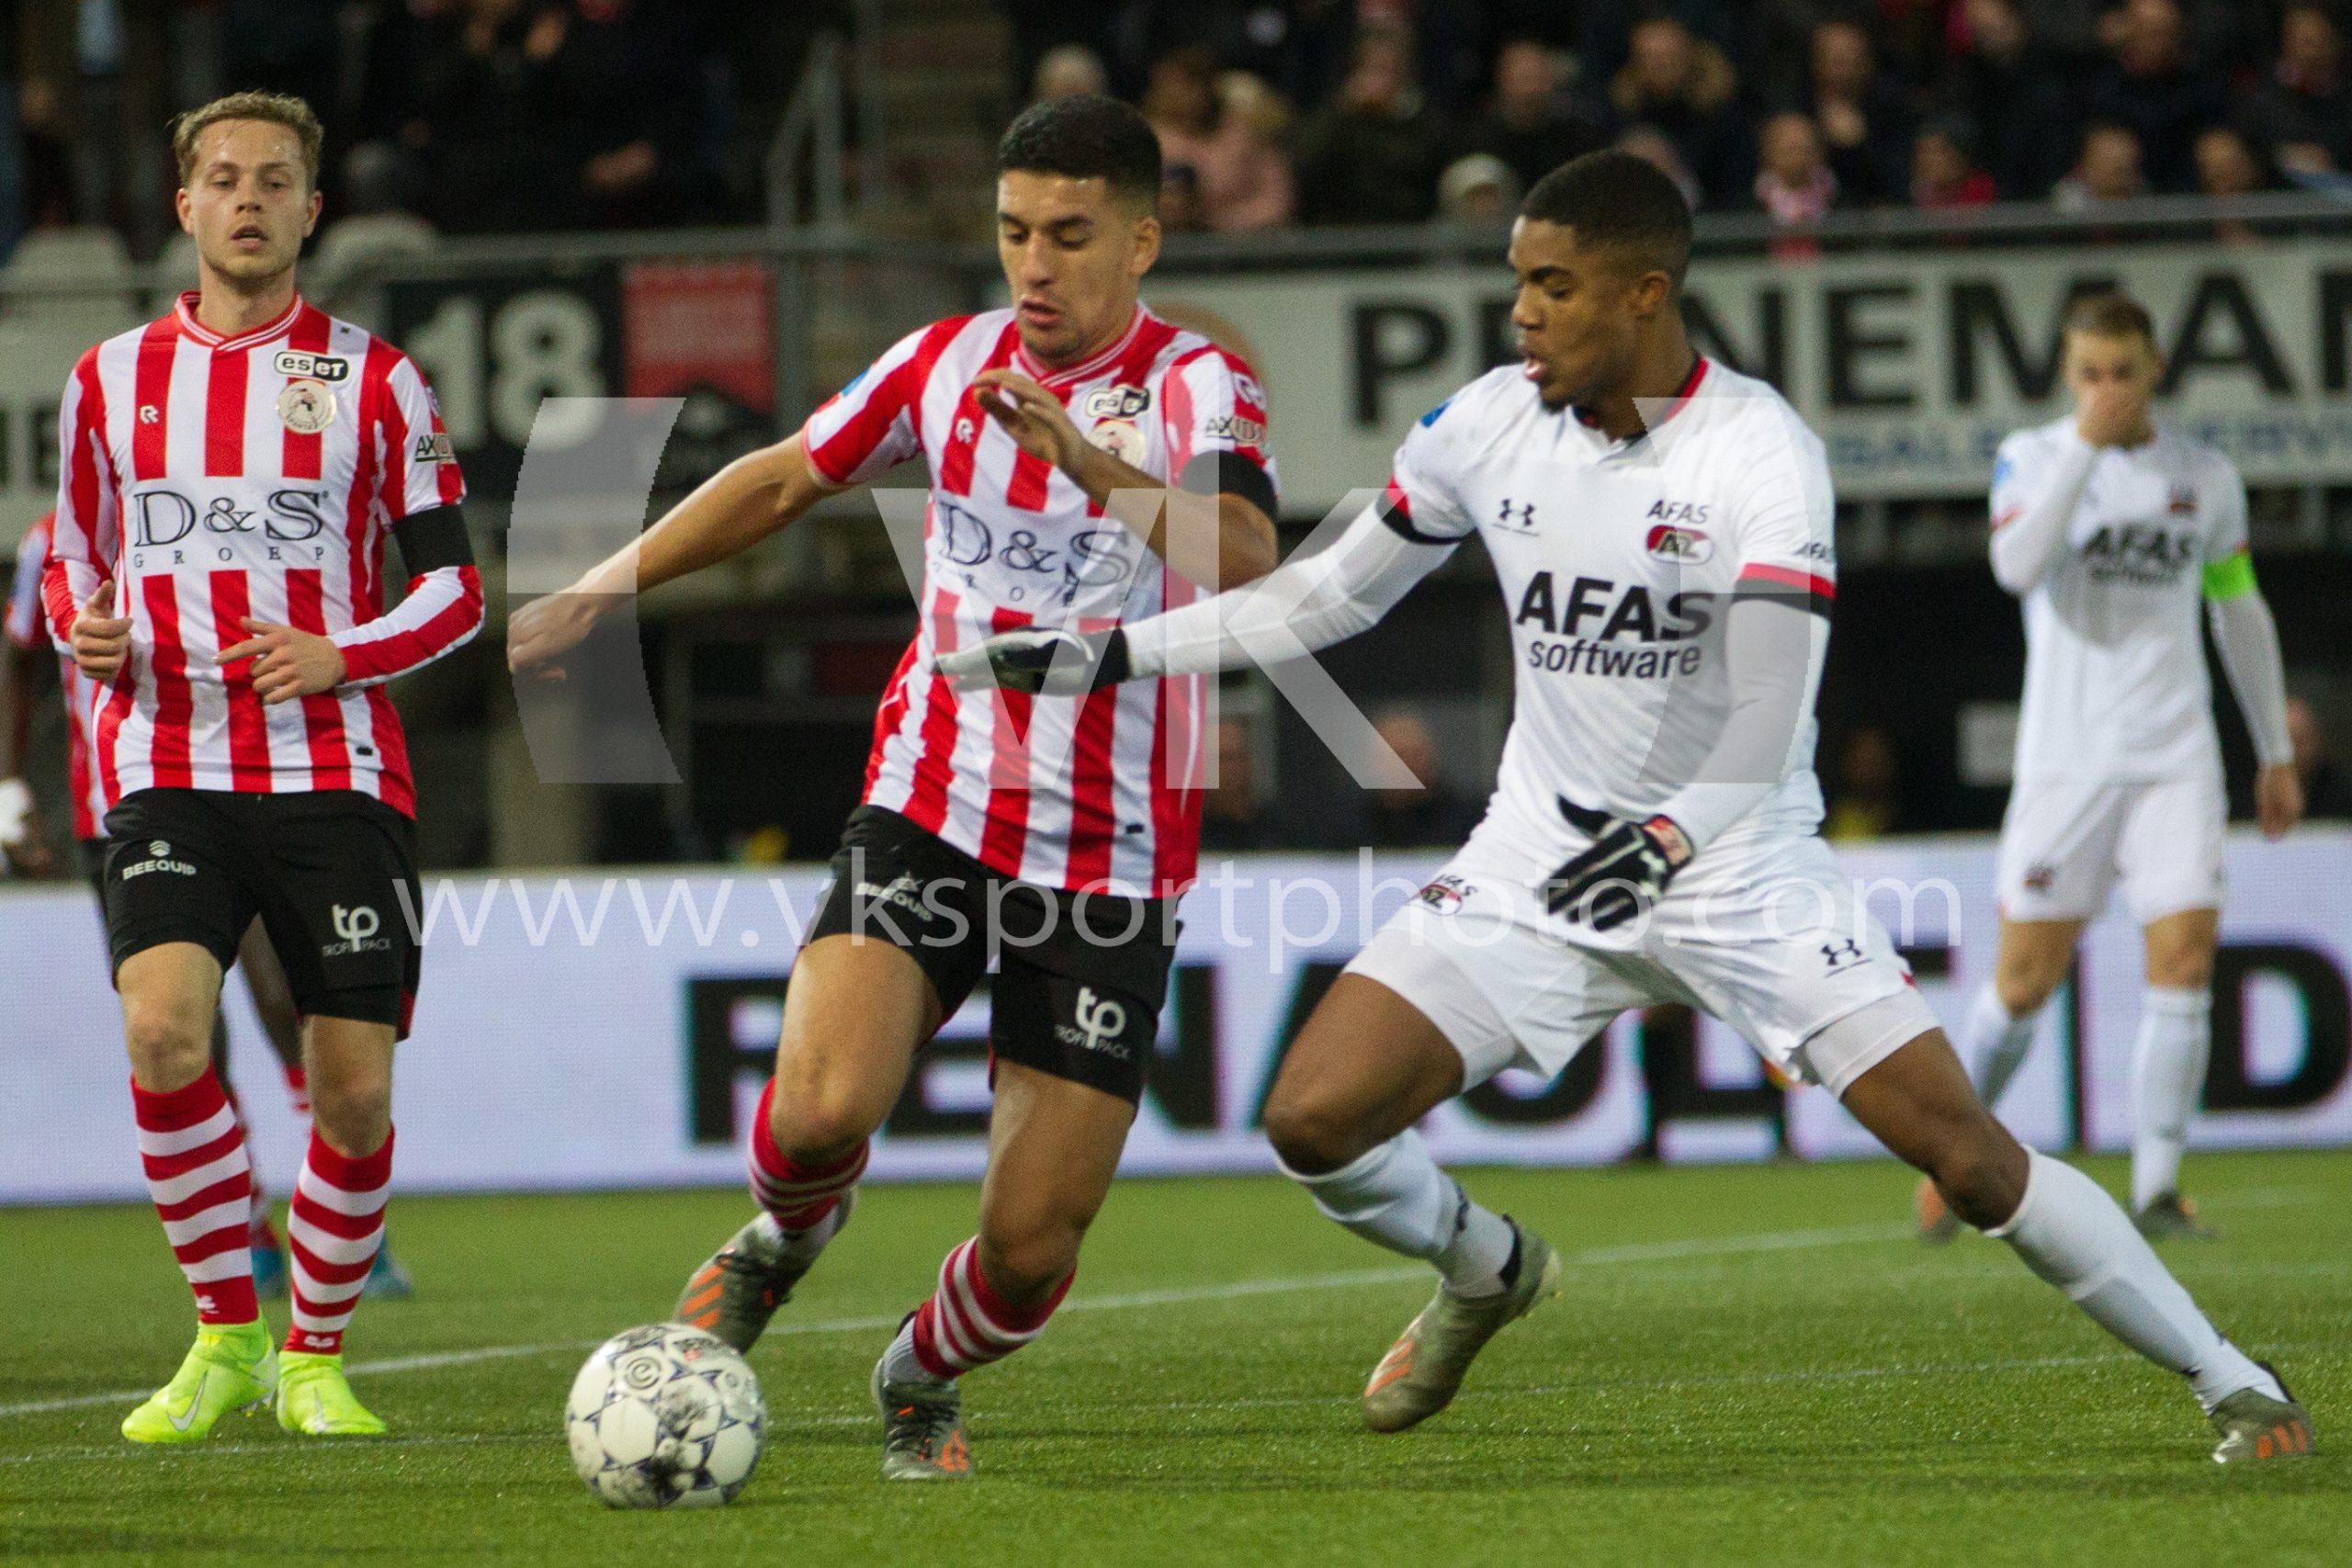 Sparta Rotterdam - AZ Alkmaar (Foto: Ruben Zegers)